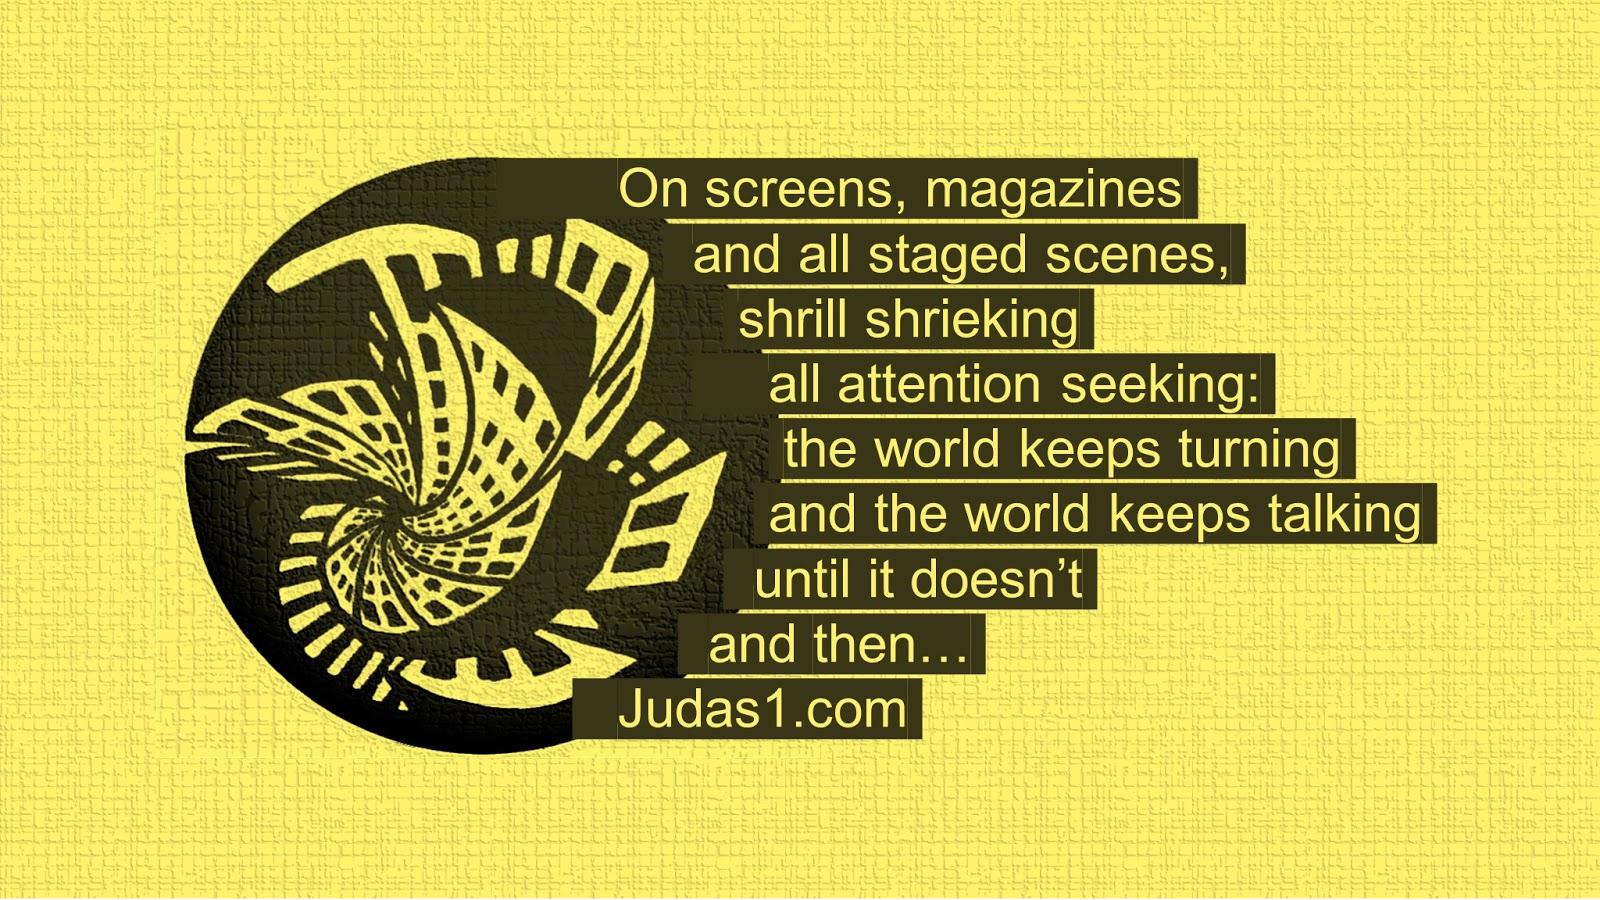 Scream screens poem by Judas1